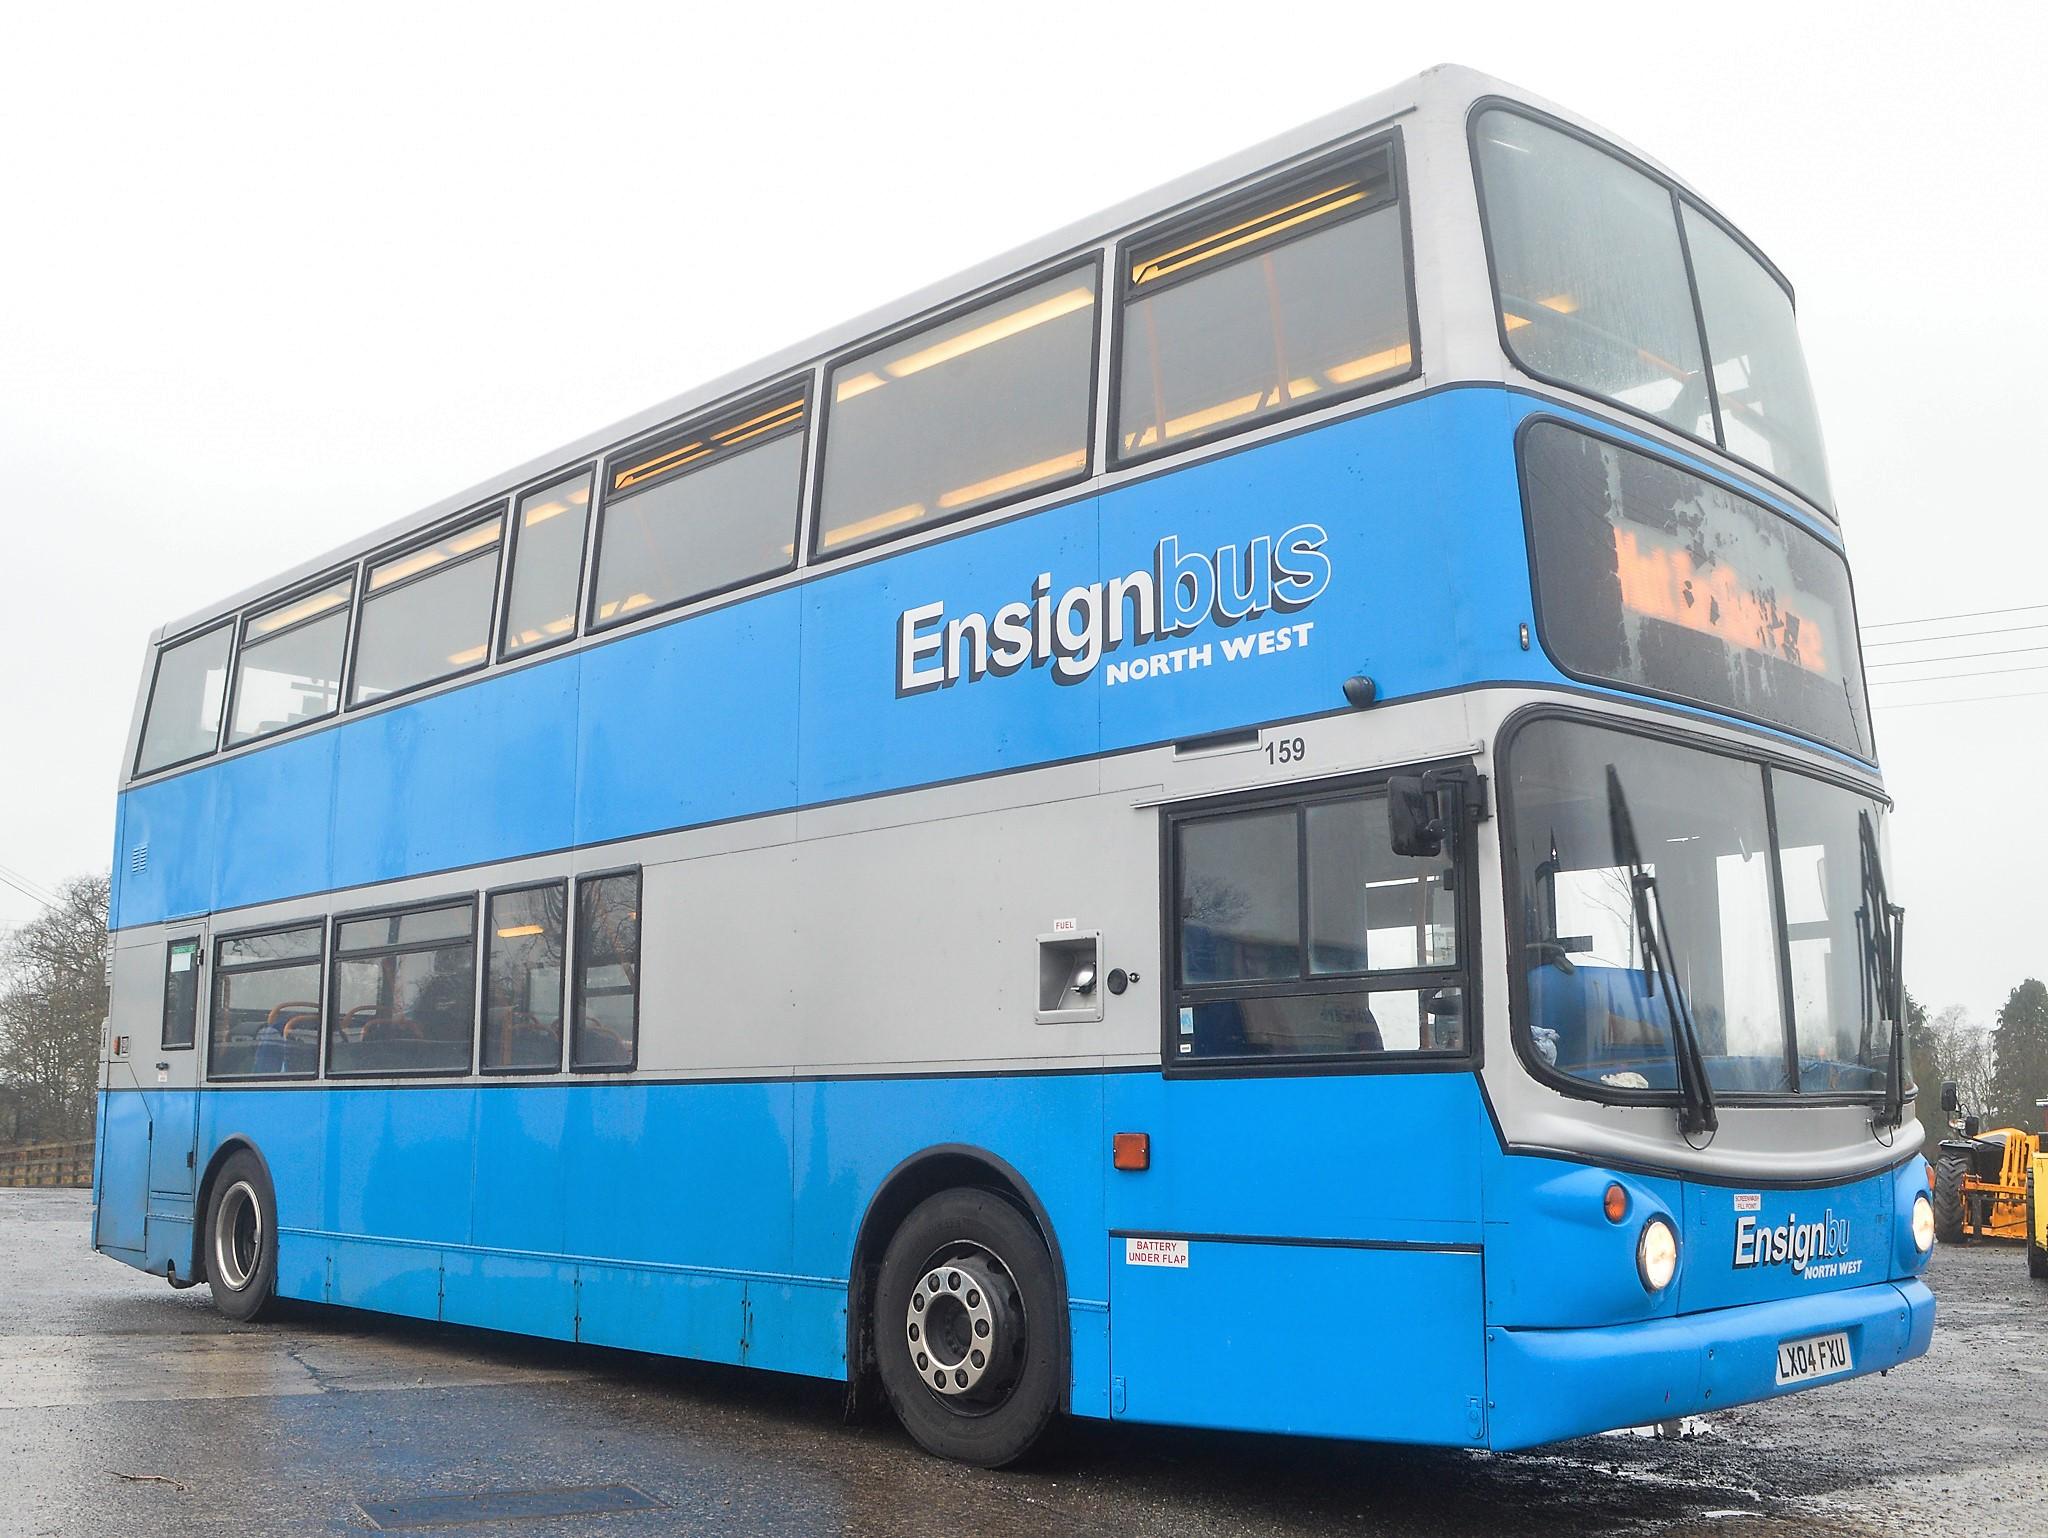 Lot 6 - Alexander Dennis Trident TransBus 80 seat double deck service bus Registration Number: LX04 FXU Date